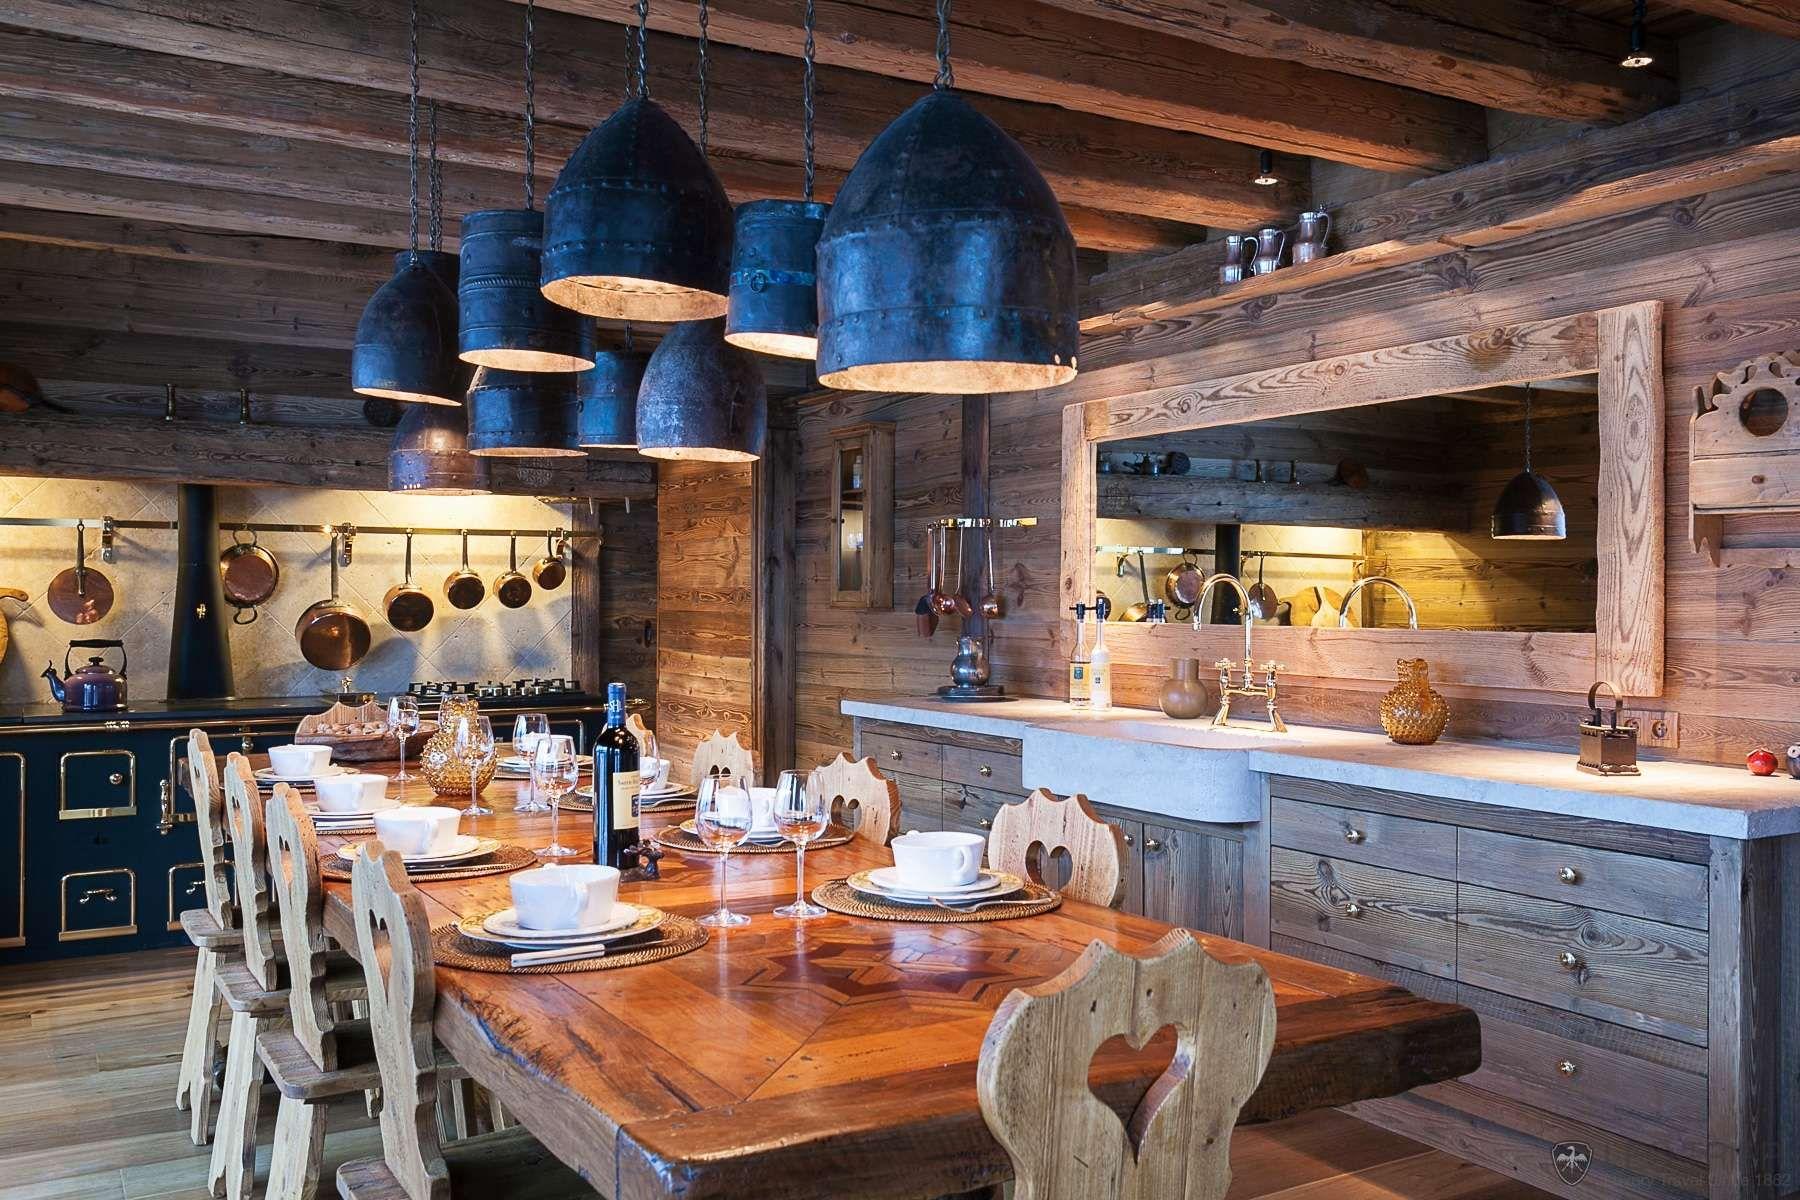 Catered Ski Chalet M ribel - Lodge SHL   Leo Trippi   Cabin   Pinterest